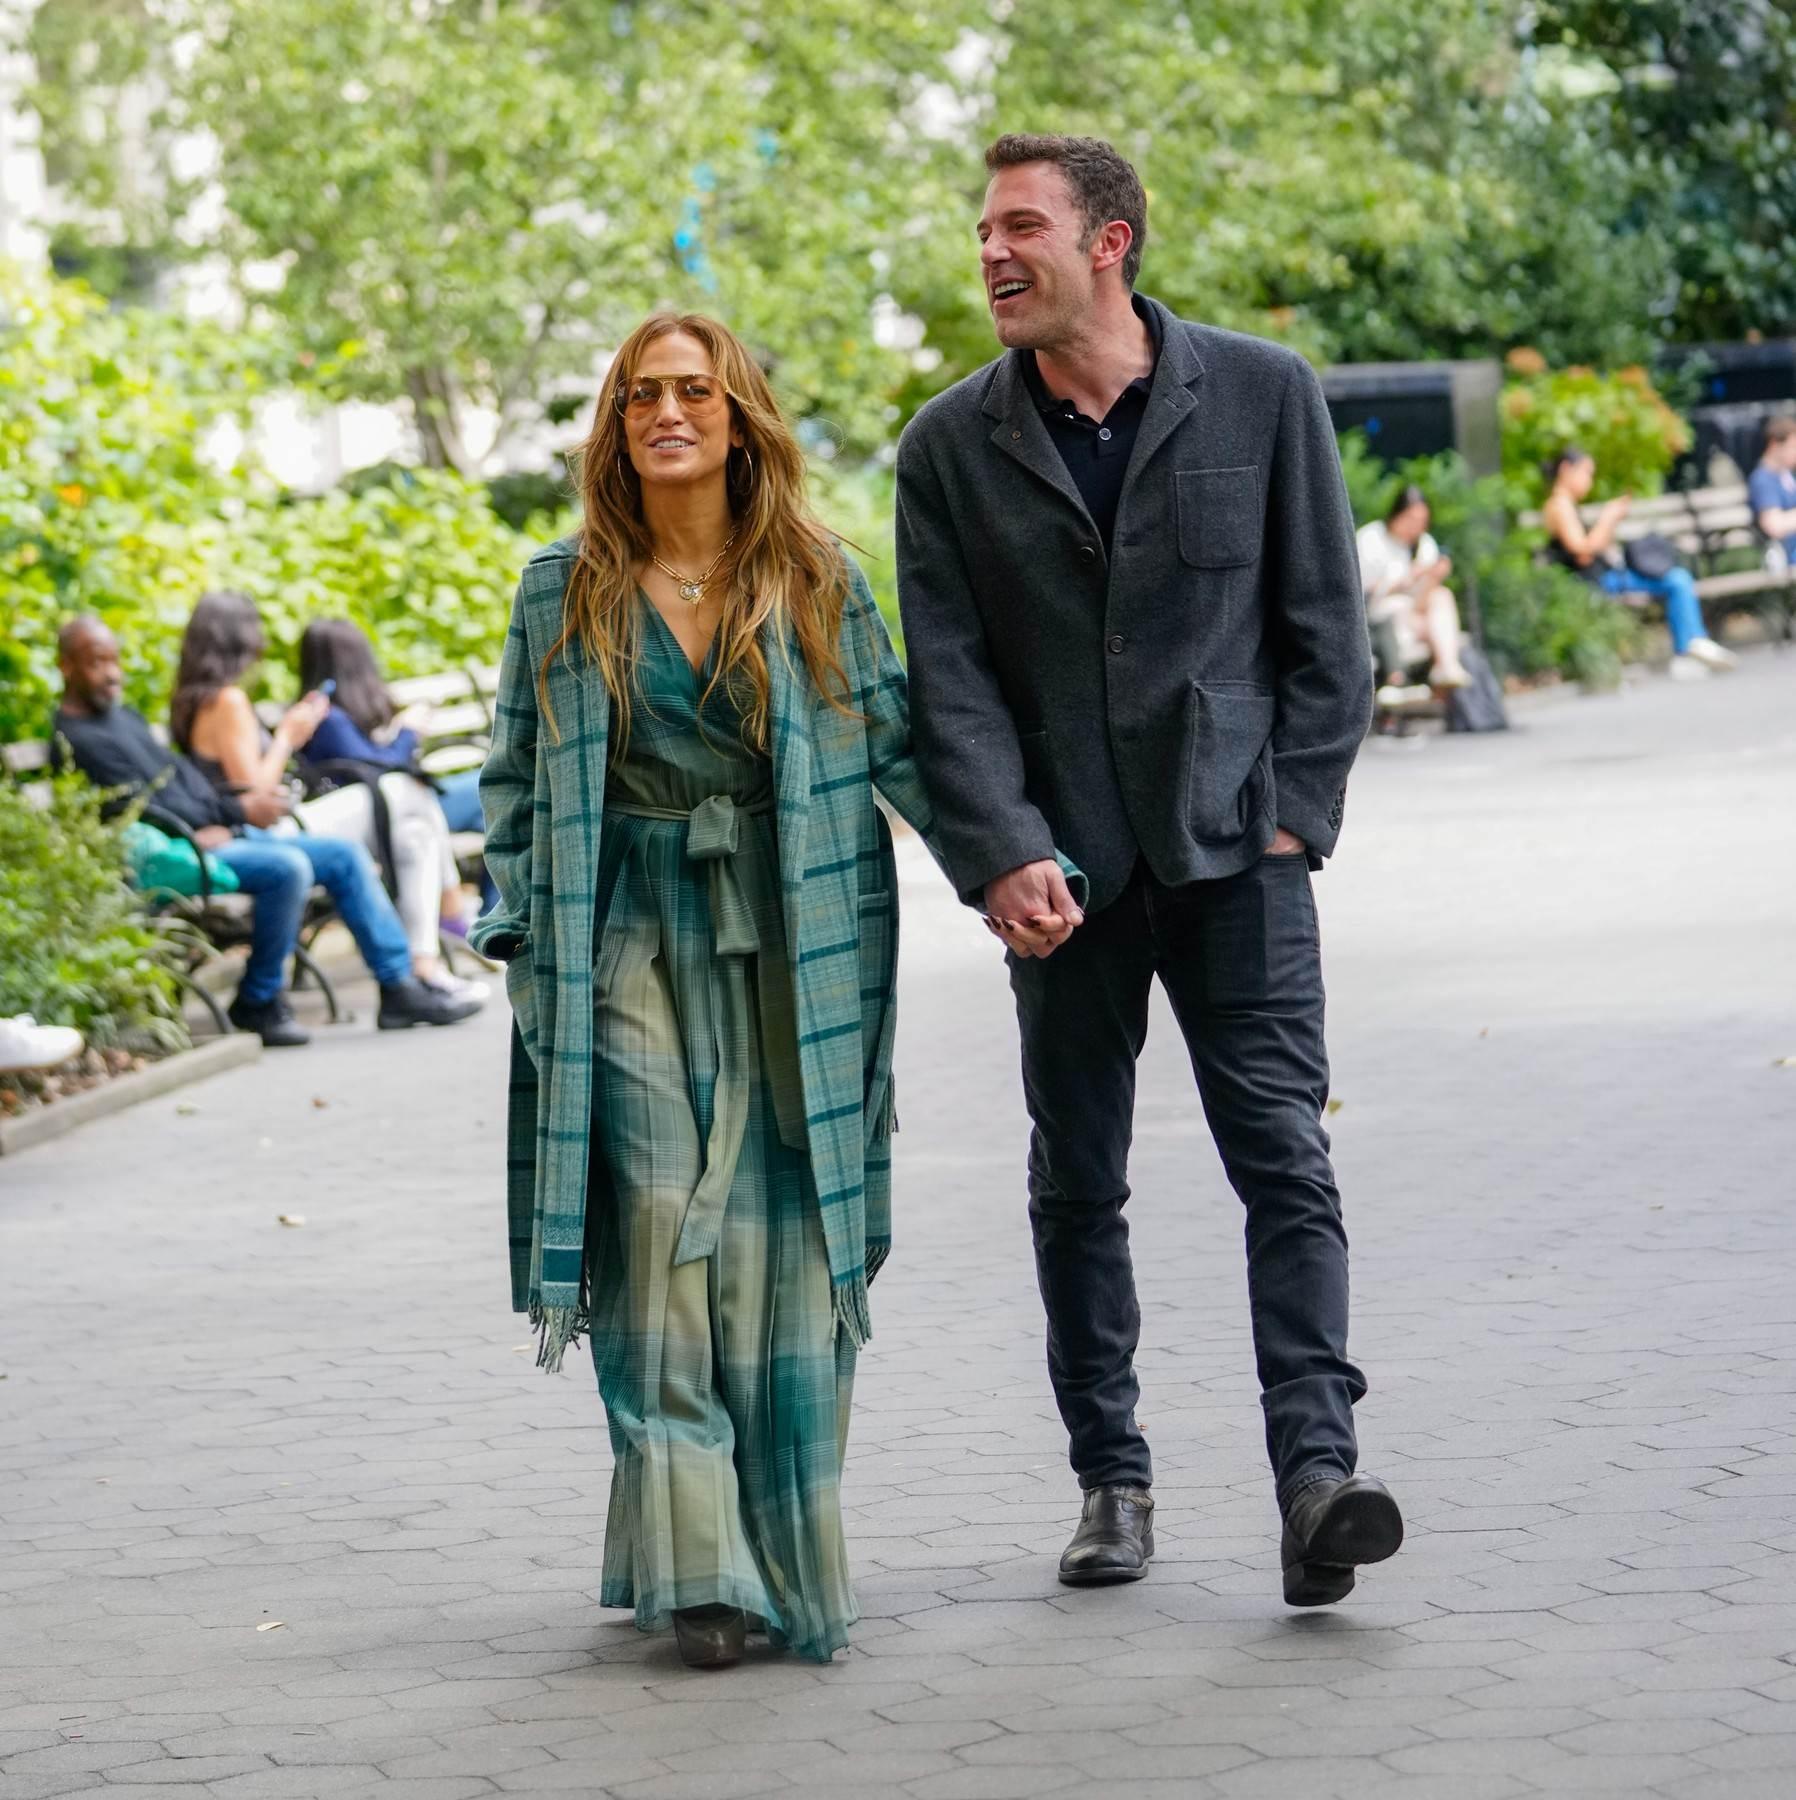 ROMANTIČNA JESEN U NJUJORKU: Jennifer Lopez i Ben Affleck u superšik  outfitima za šetnju po gradu   Elle